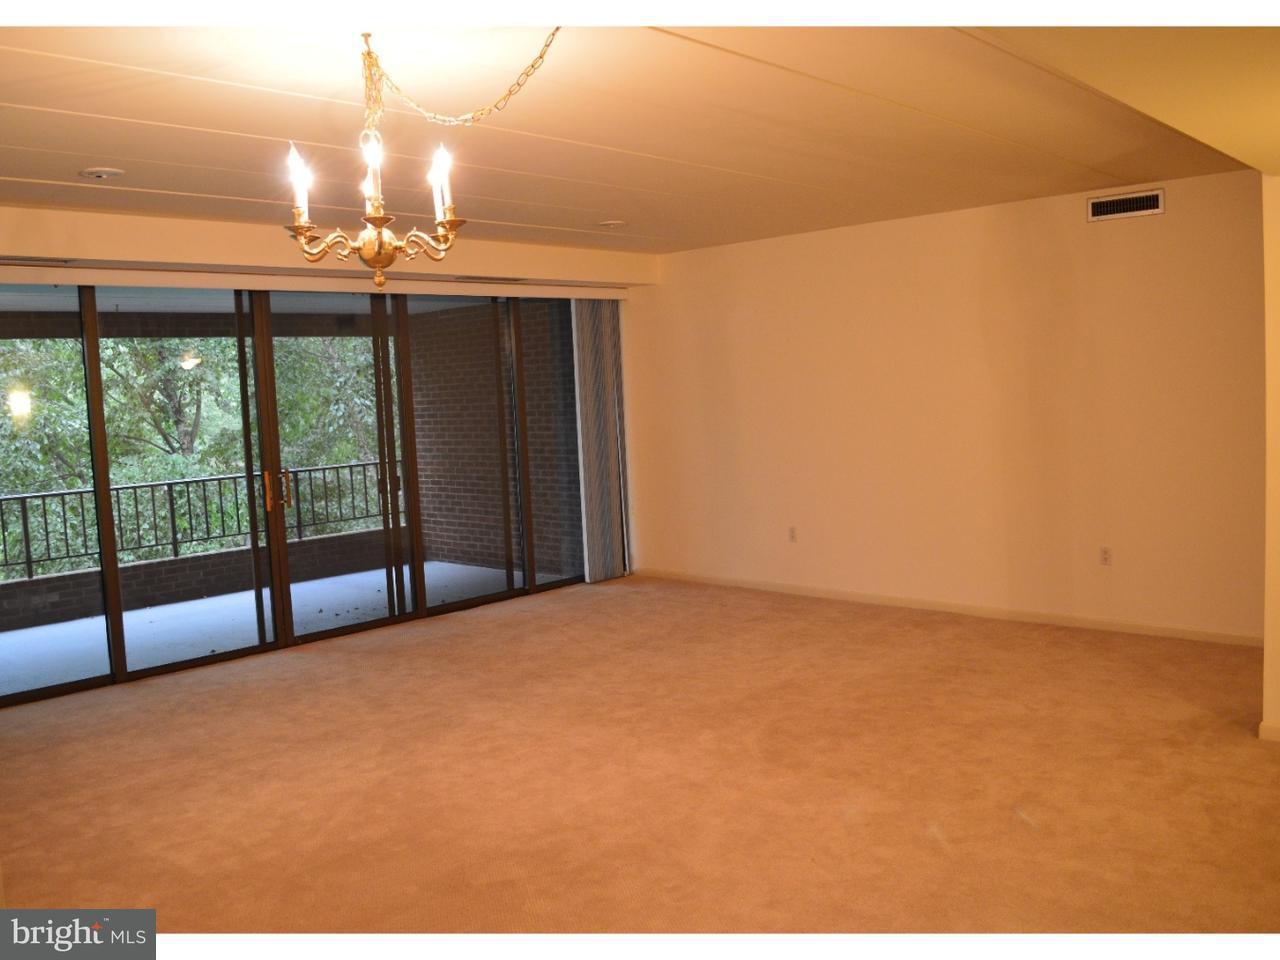 独户住宅 为 出租 在 614 LOVEVILLE RD #E4I Hockessin, 特拉华州 19707 美国